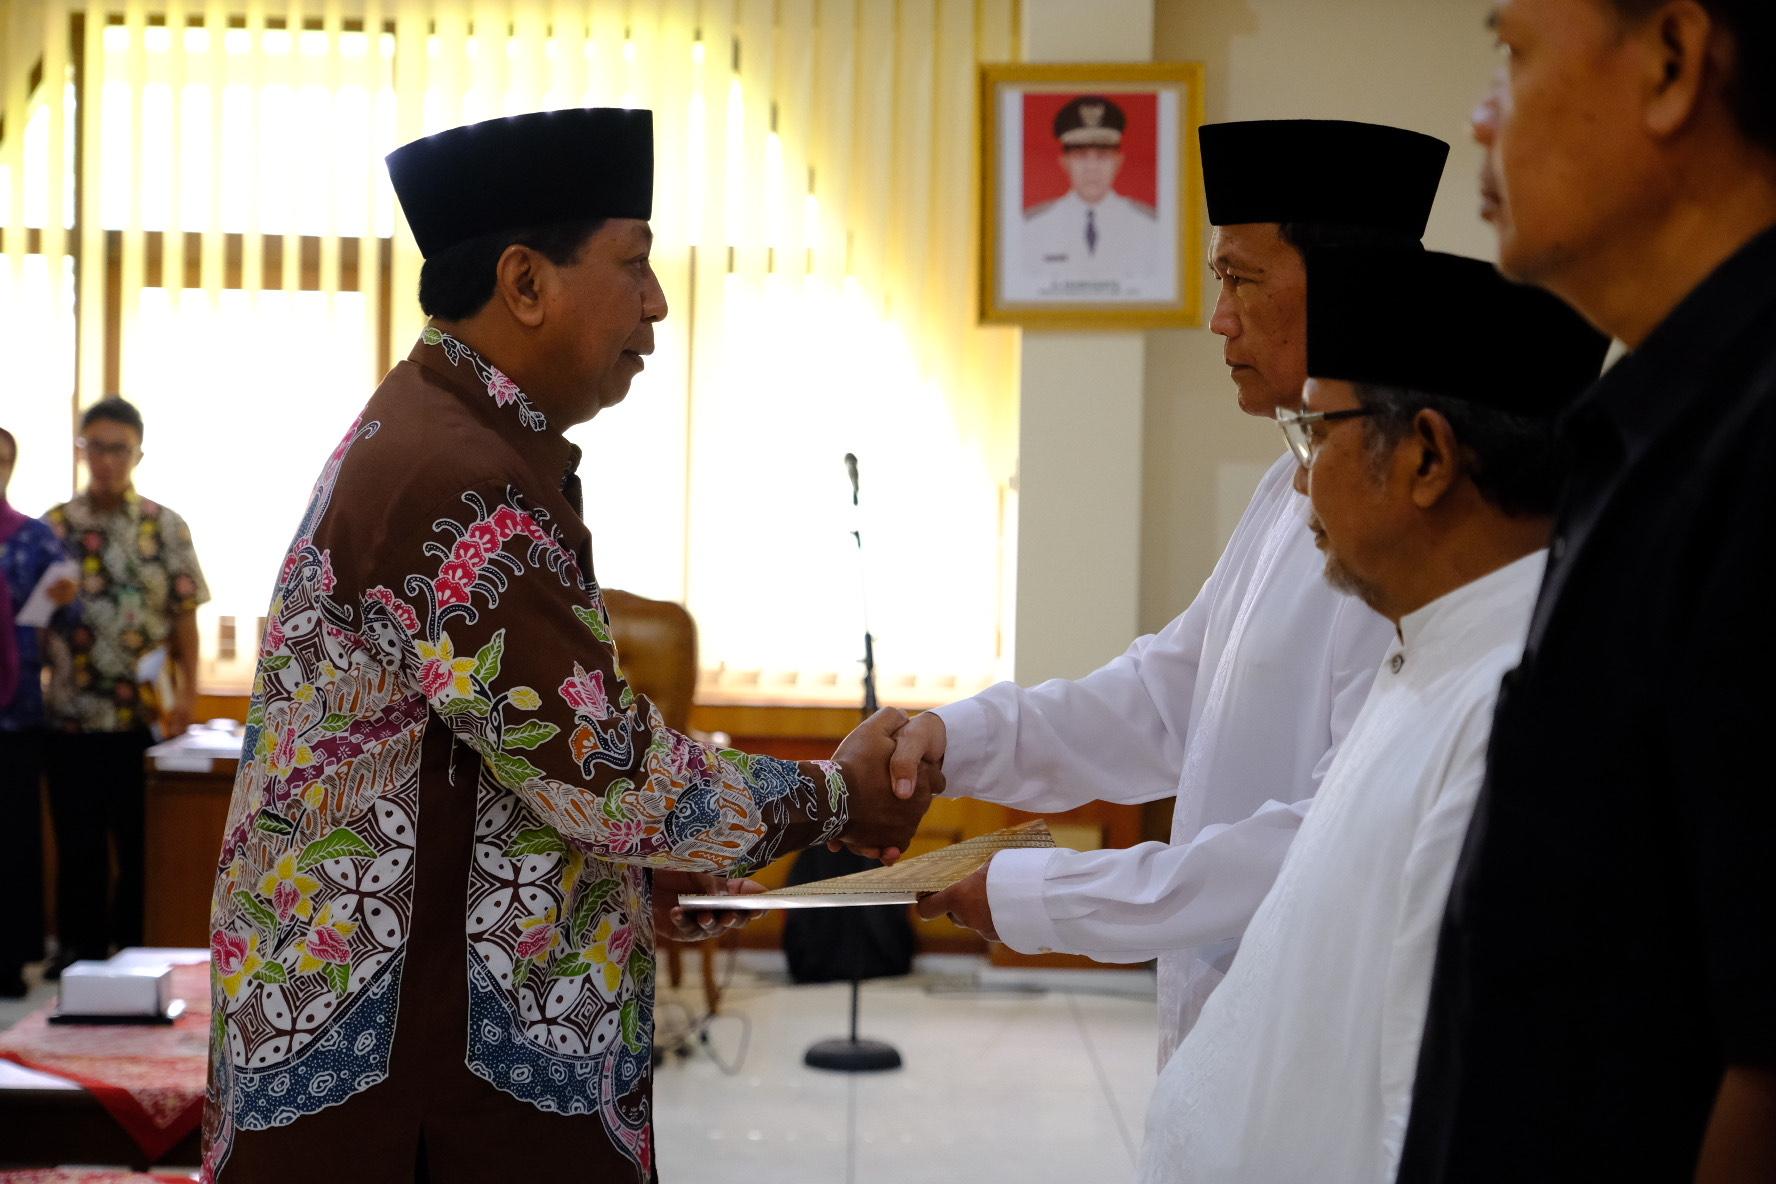 Wali Kota Magelang Ingin Bangun Masjid Raya